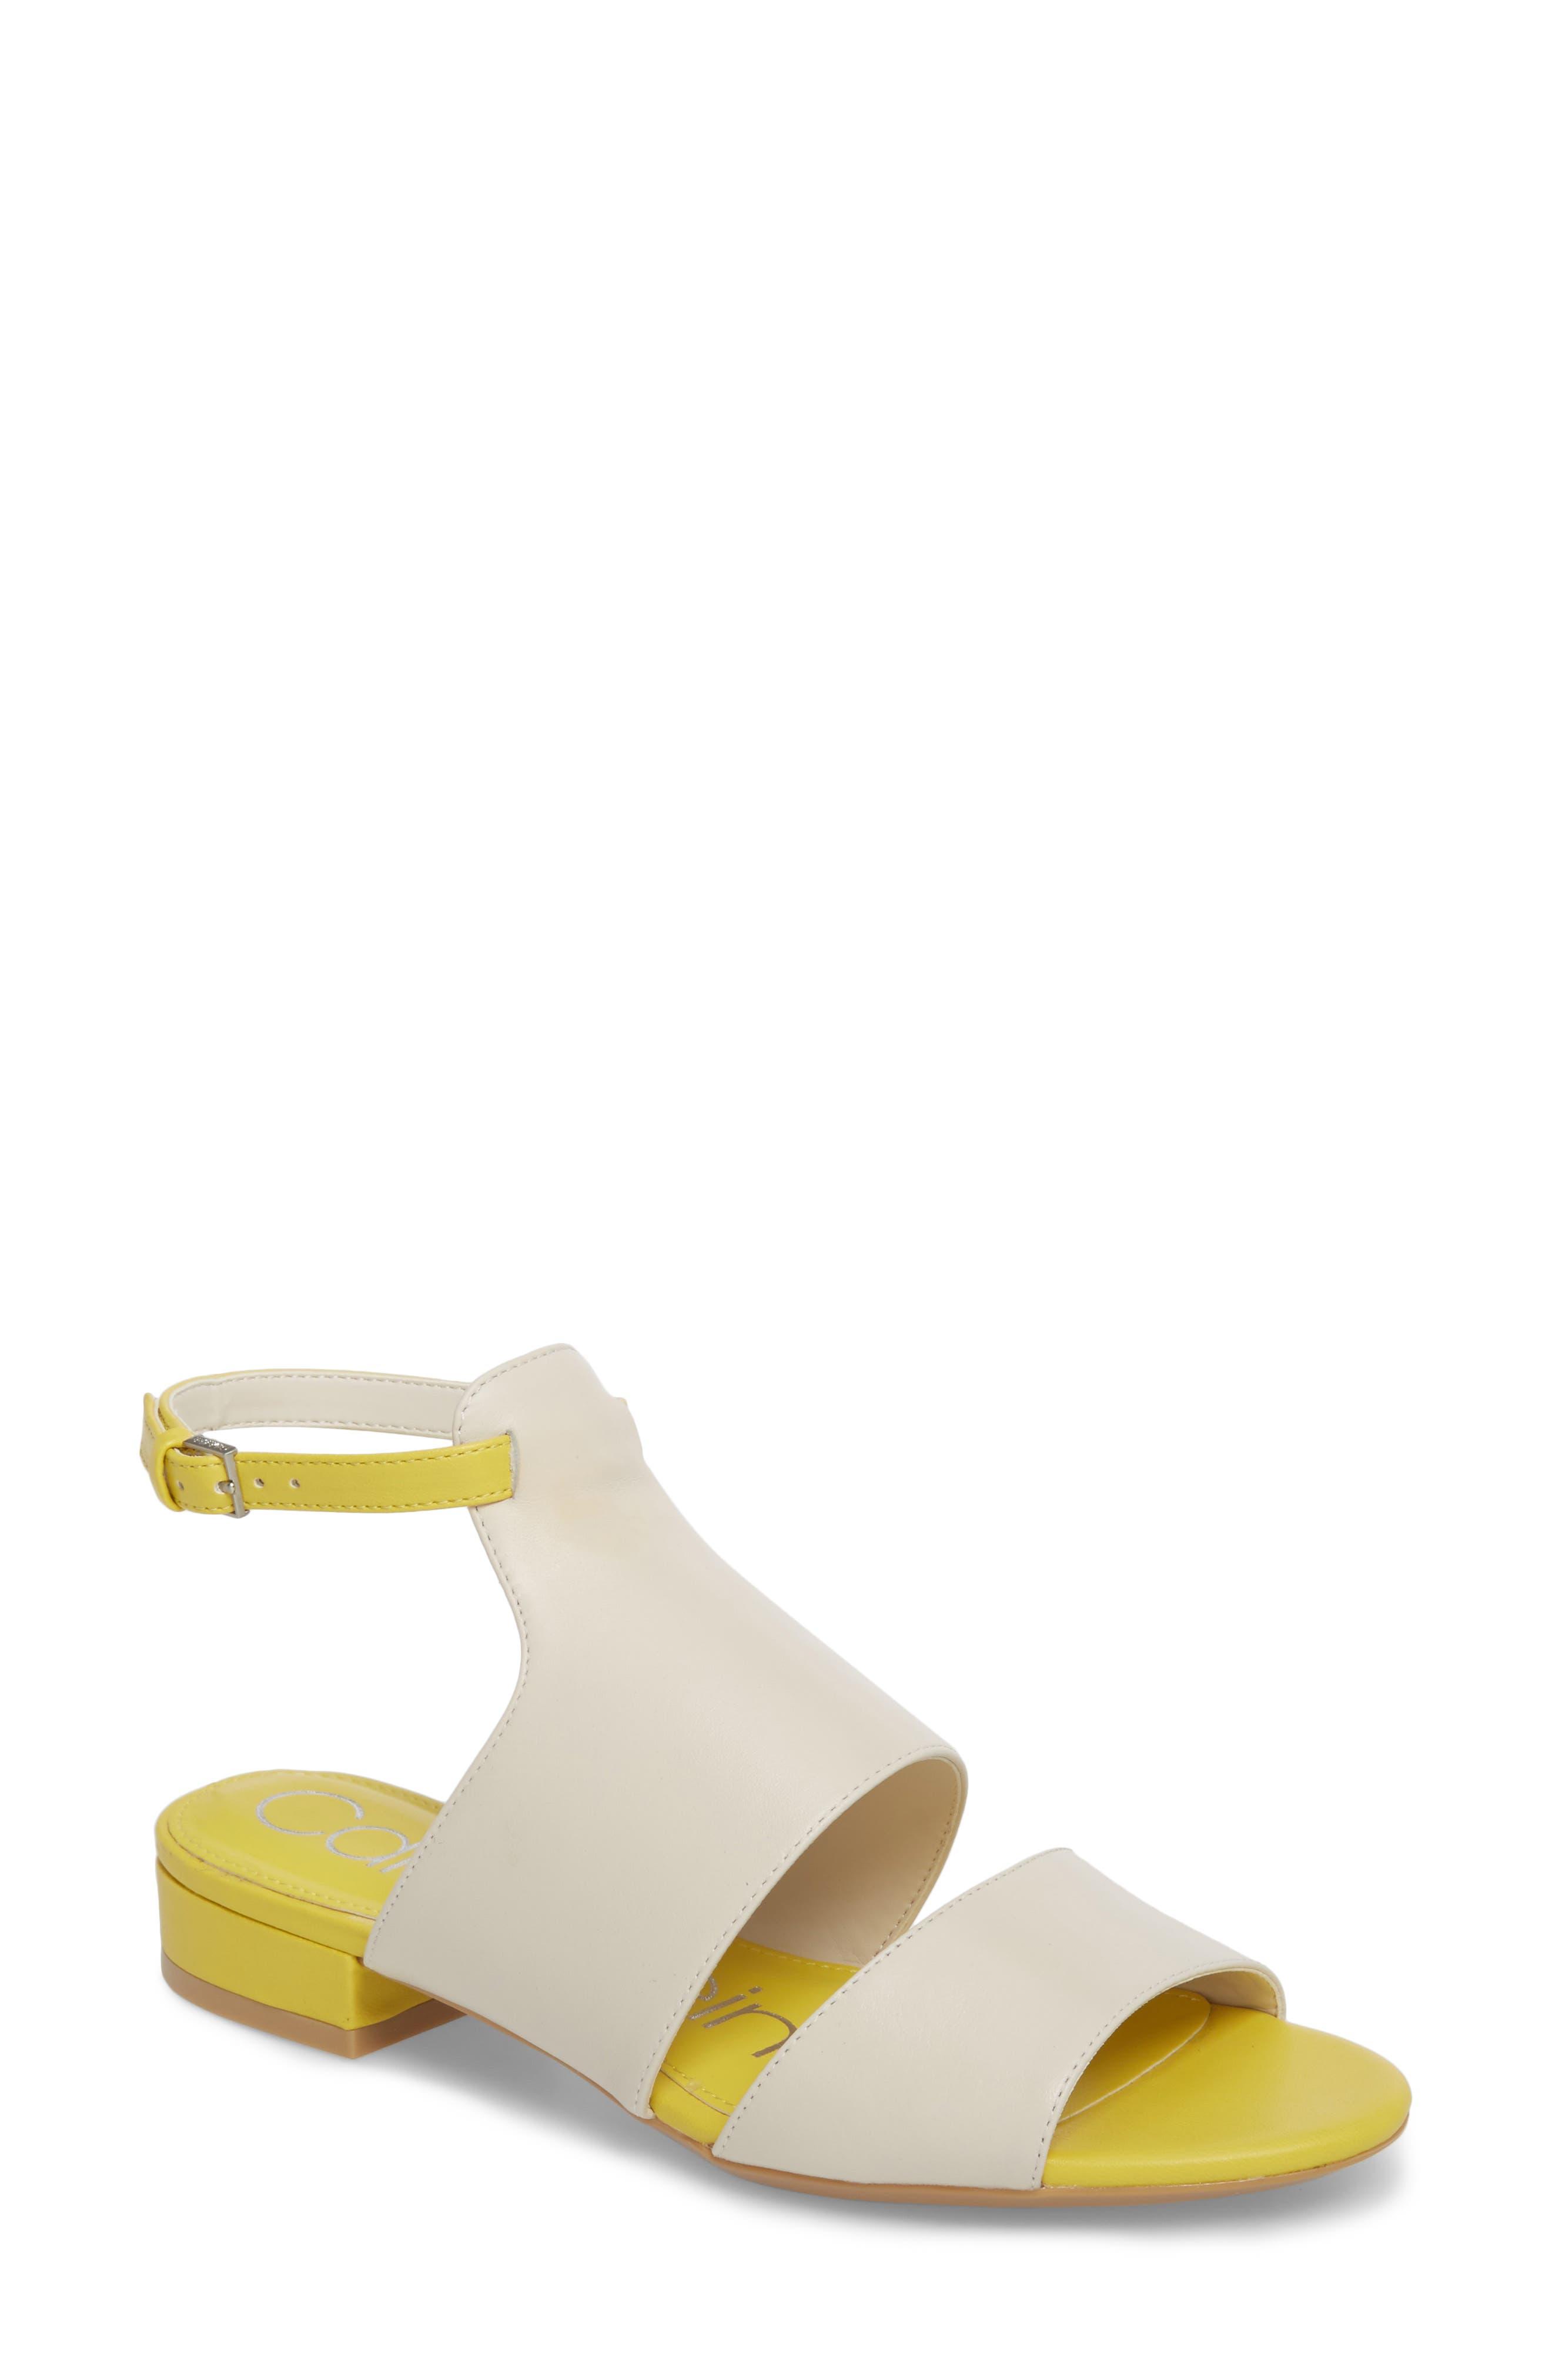 Fernarda Sandal,                         Main,                         color, Soft White Leather